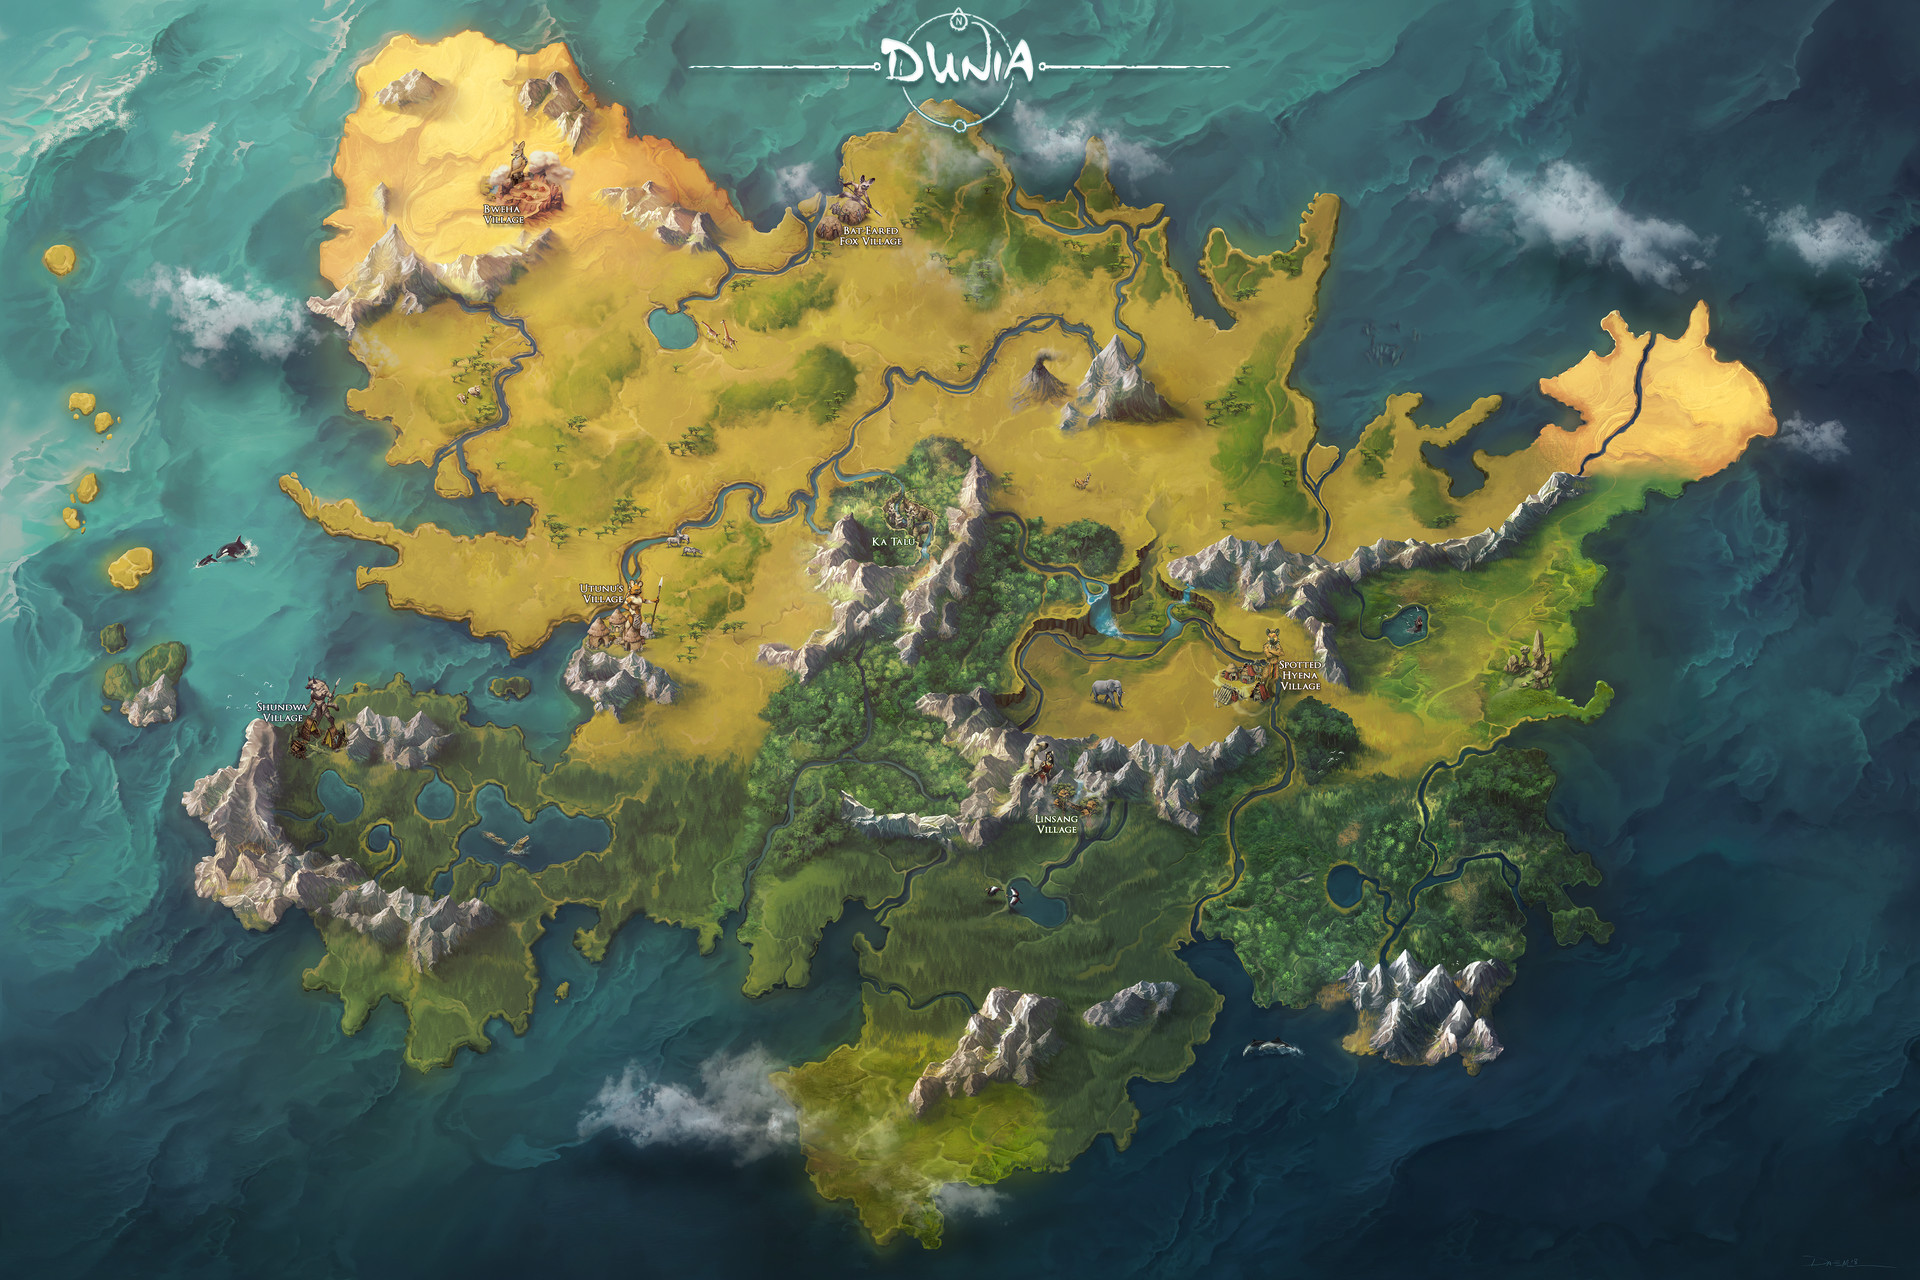 Damien mammoliti dunia full with location